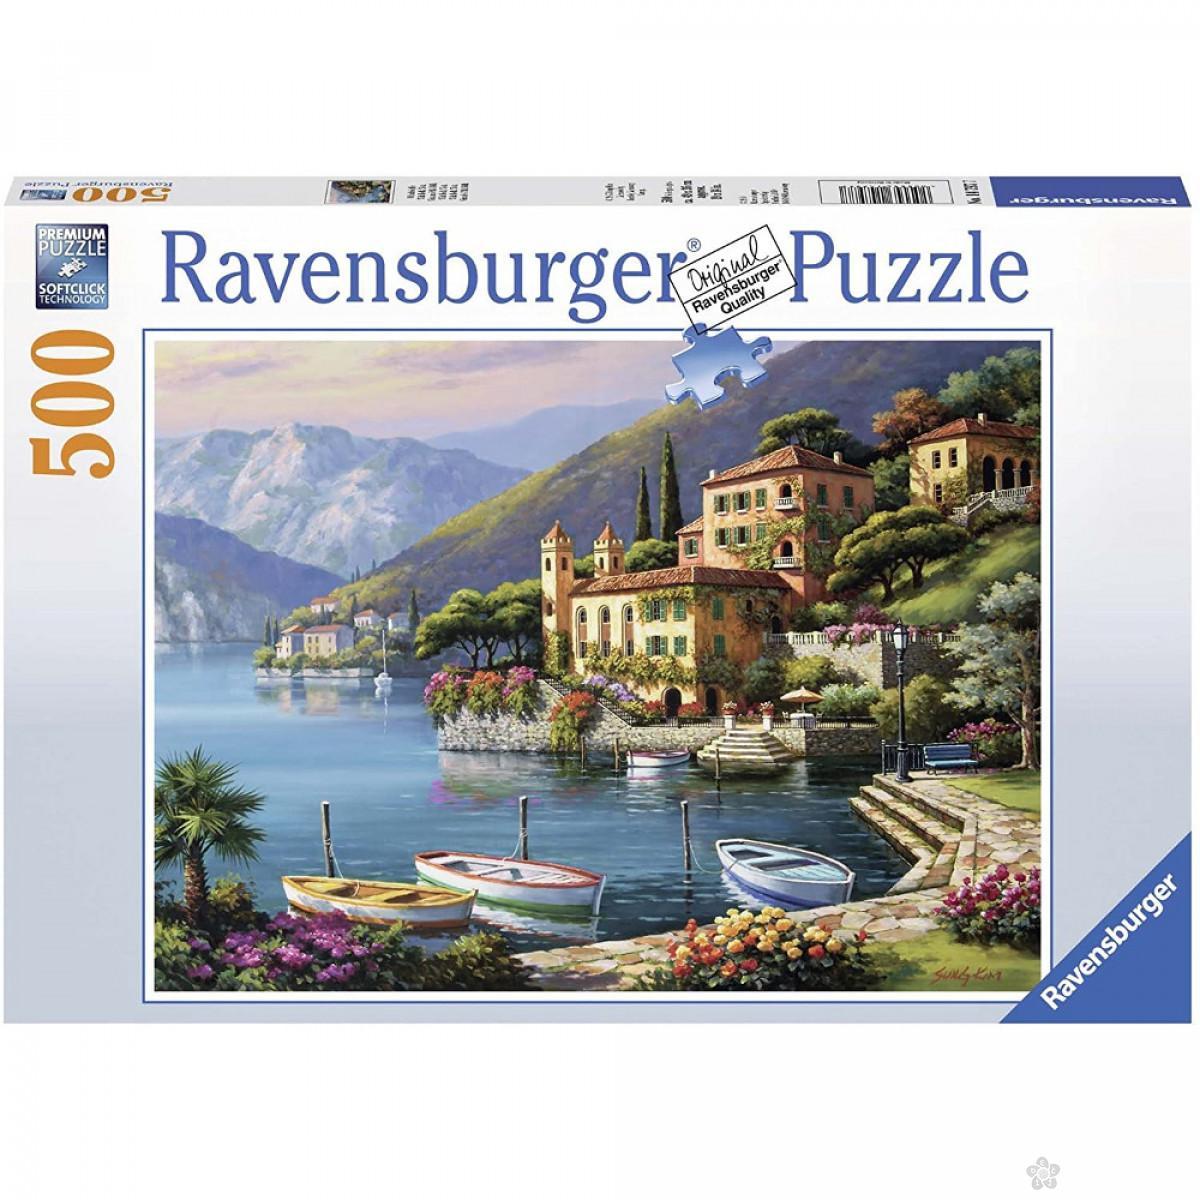 Ravensburger puzzle Savršen pogled RA14797